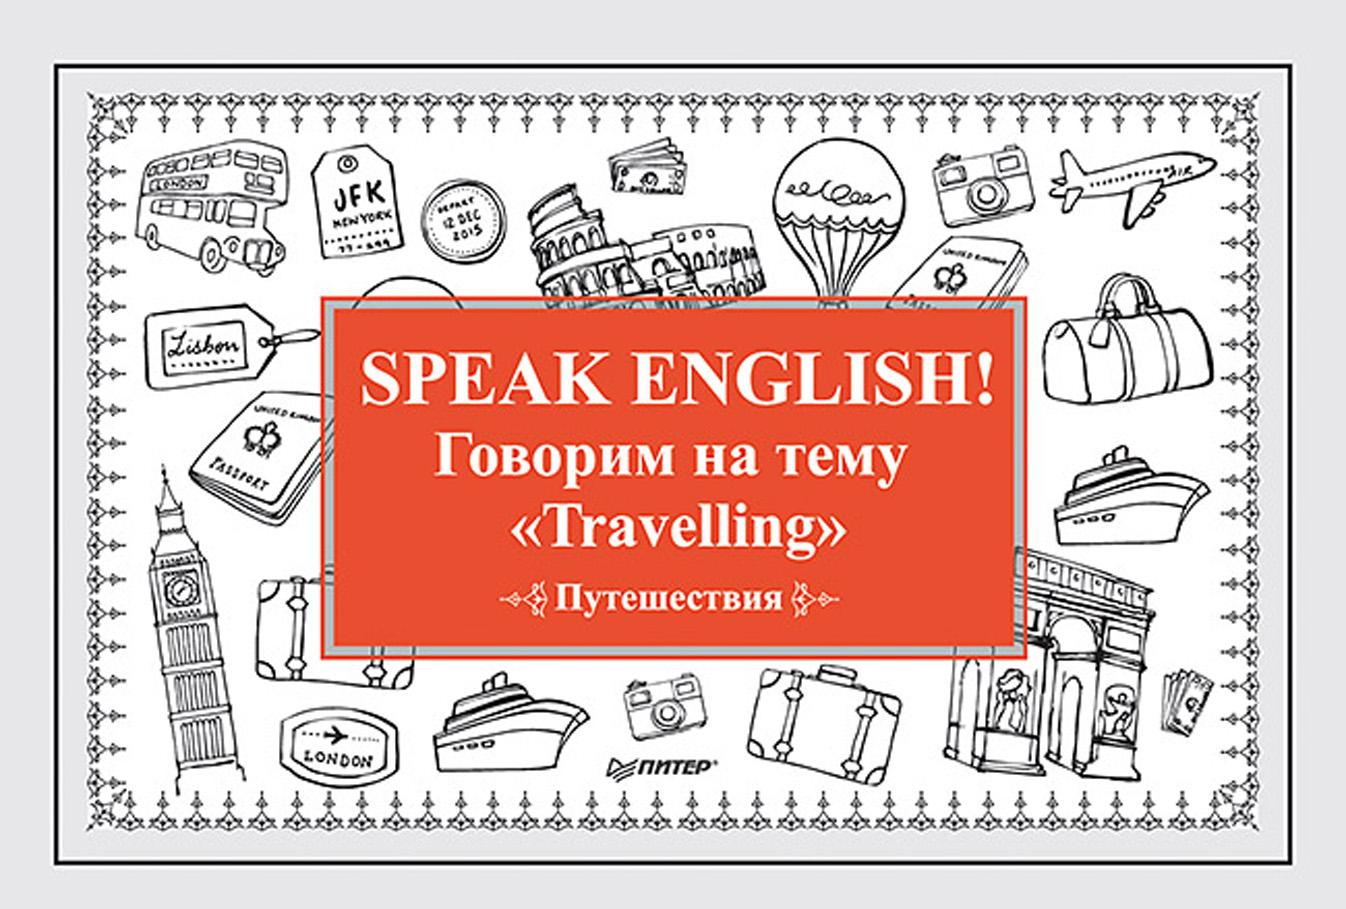 Е. Андронова Speak English! Говорим на тему «Travelling» (Путешествия) speak english говорим на тему travelling путешествия карточки